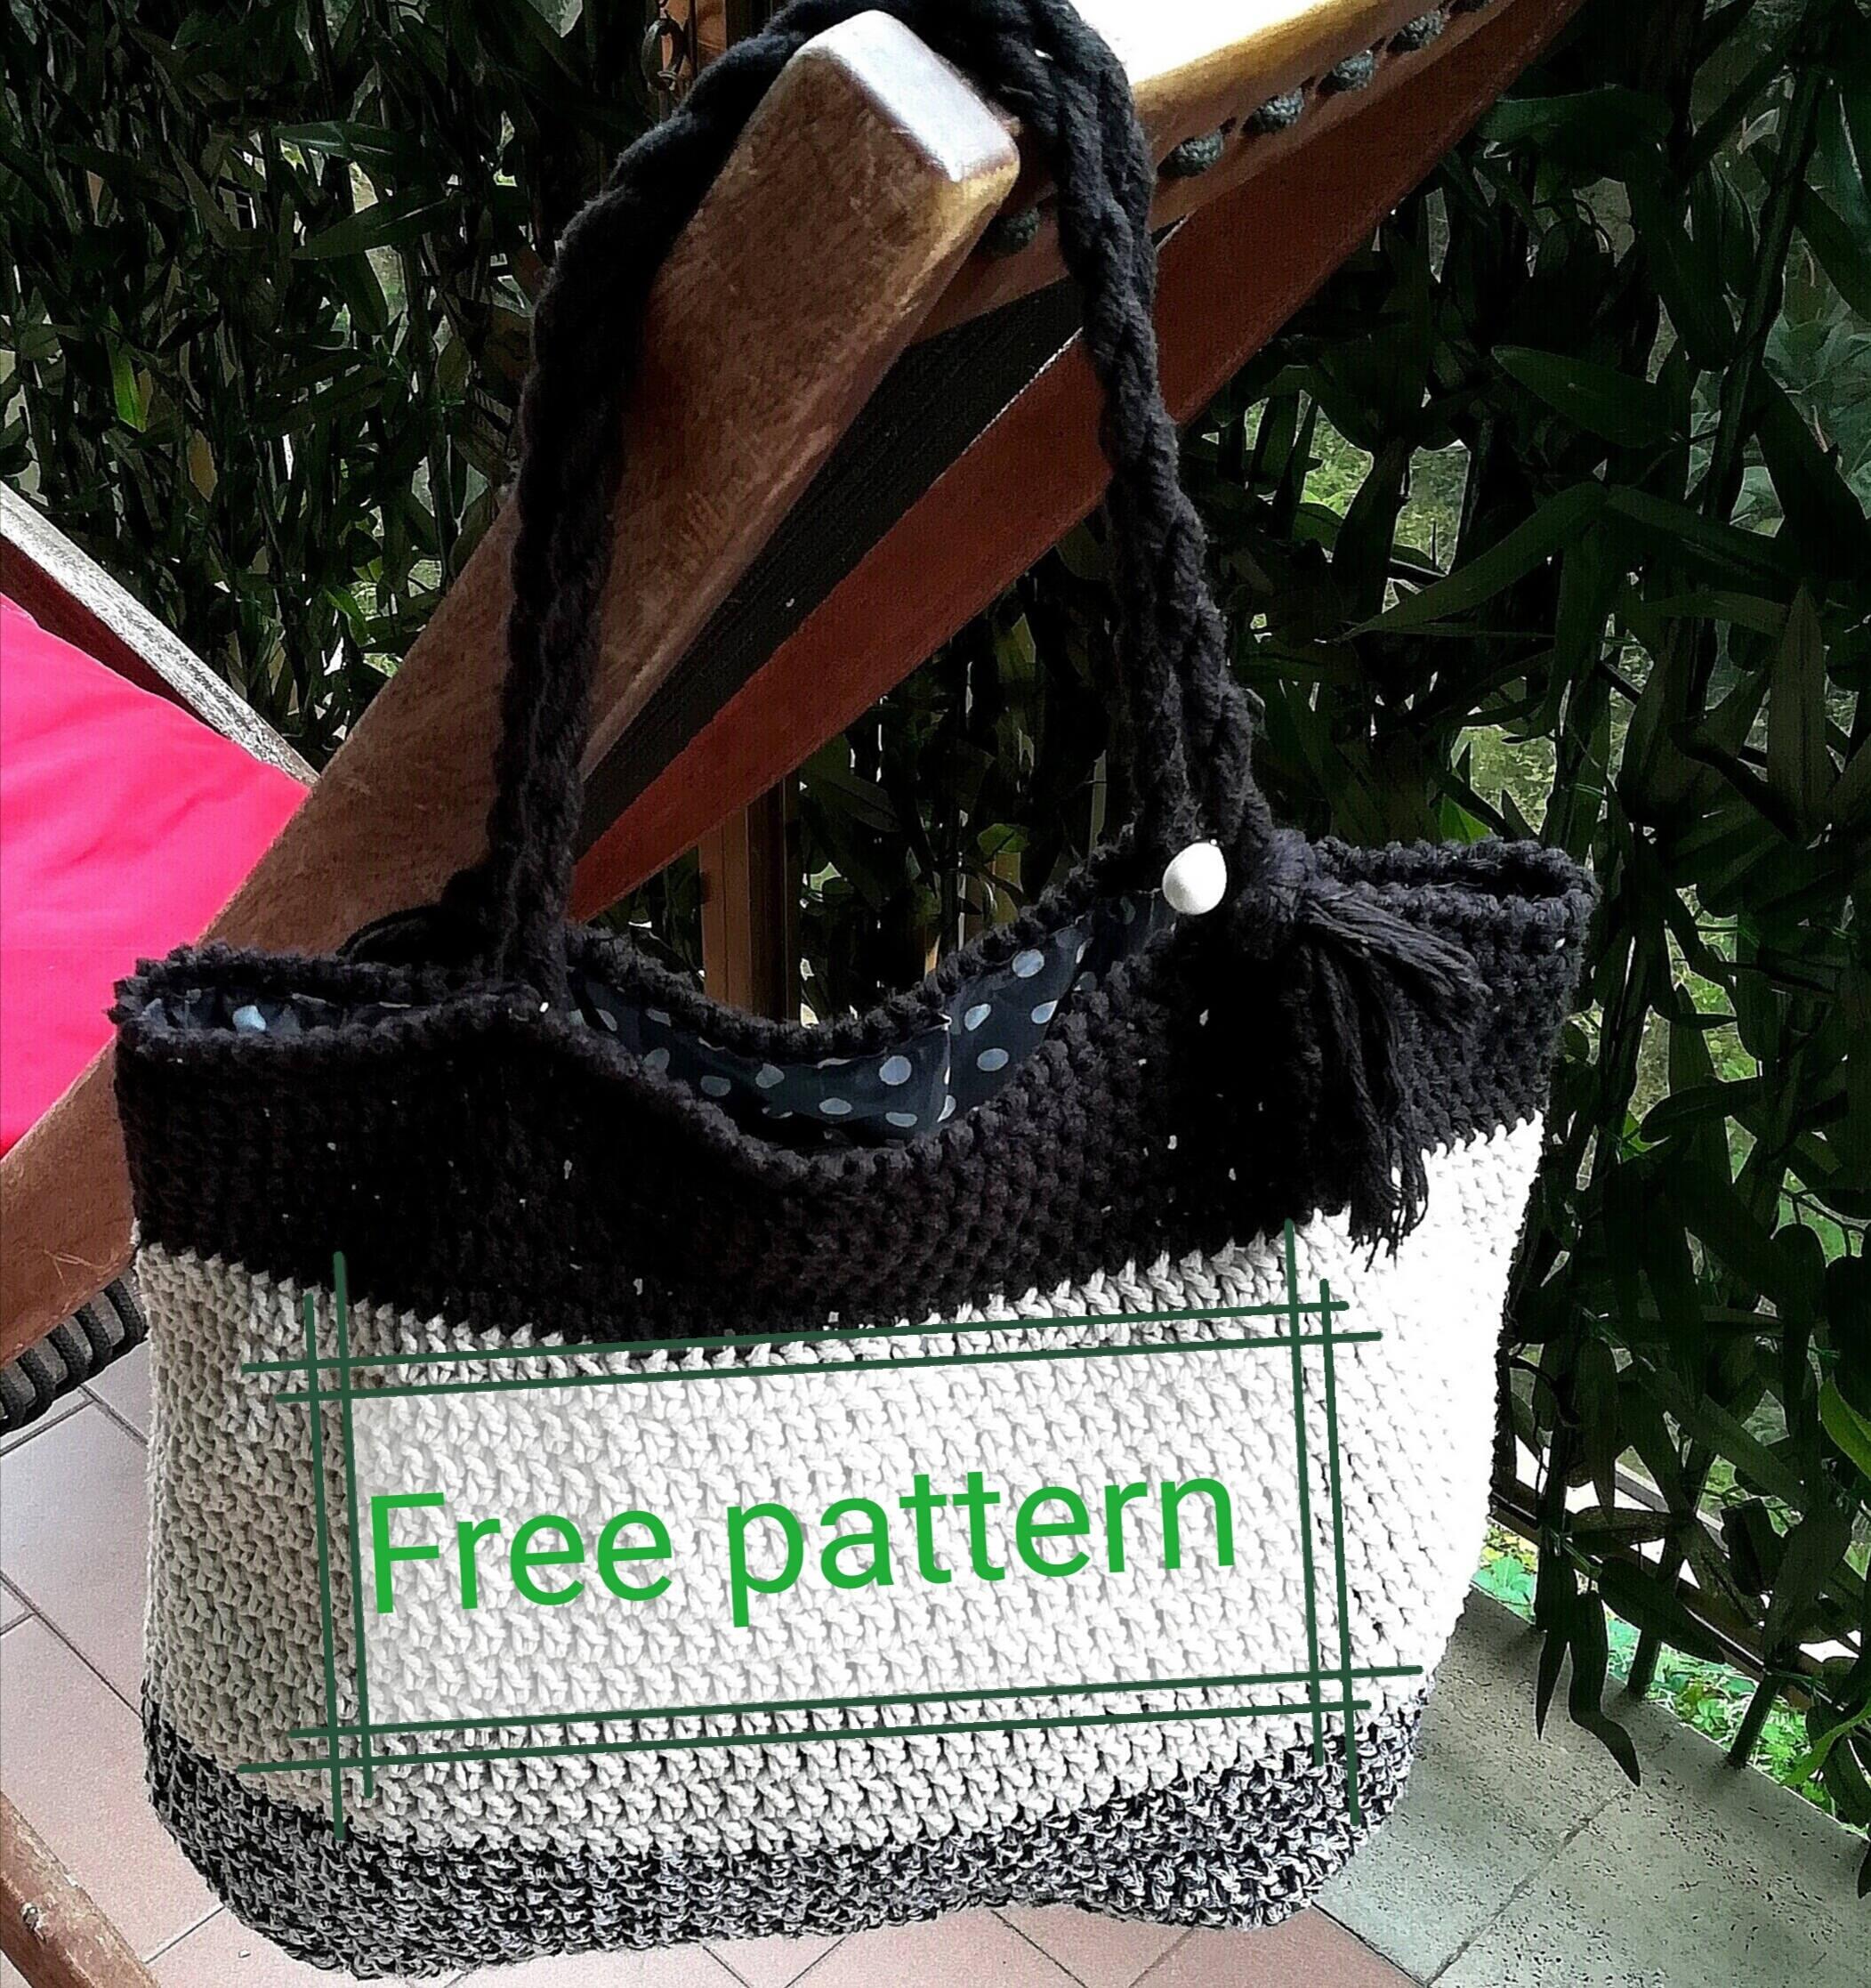 BAG PATTERN for FREE, twine tote bag, crochet bag, striped tote bag ...